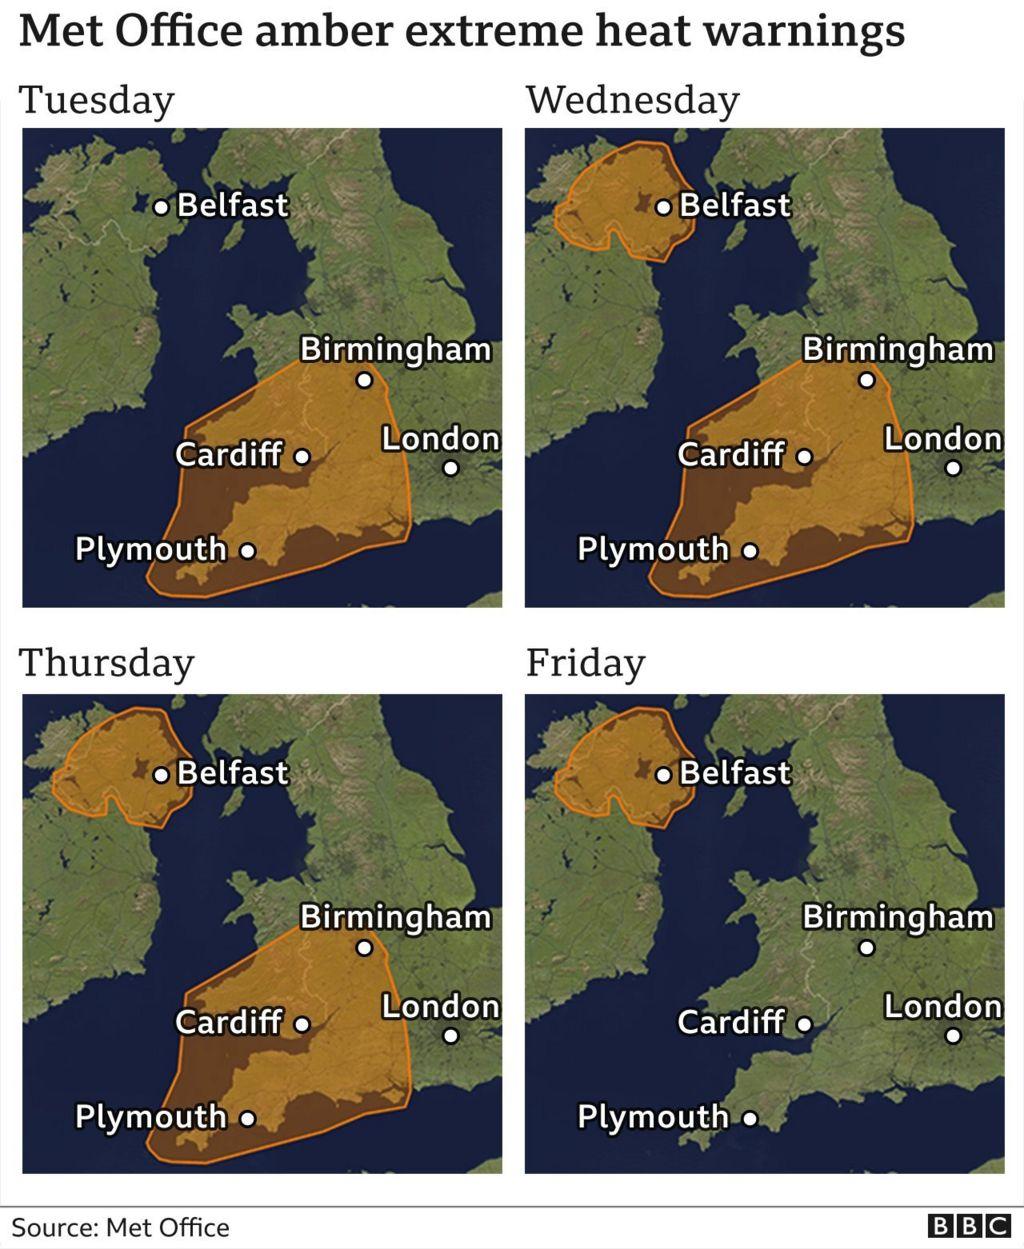 graphic showing heat warnings